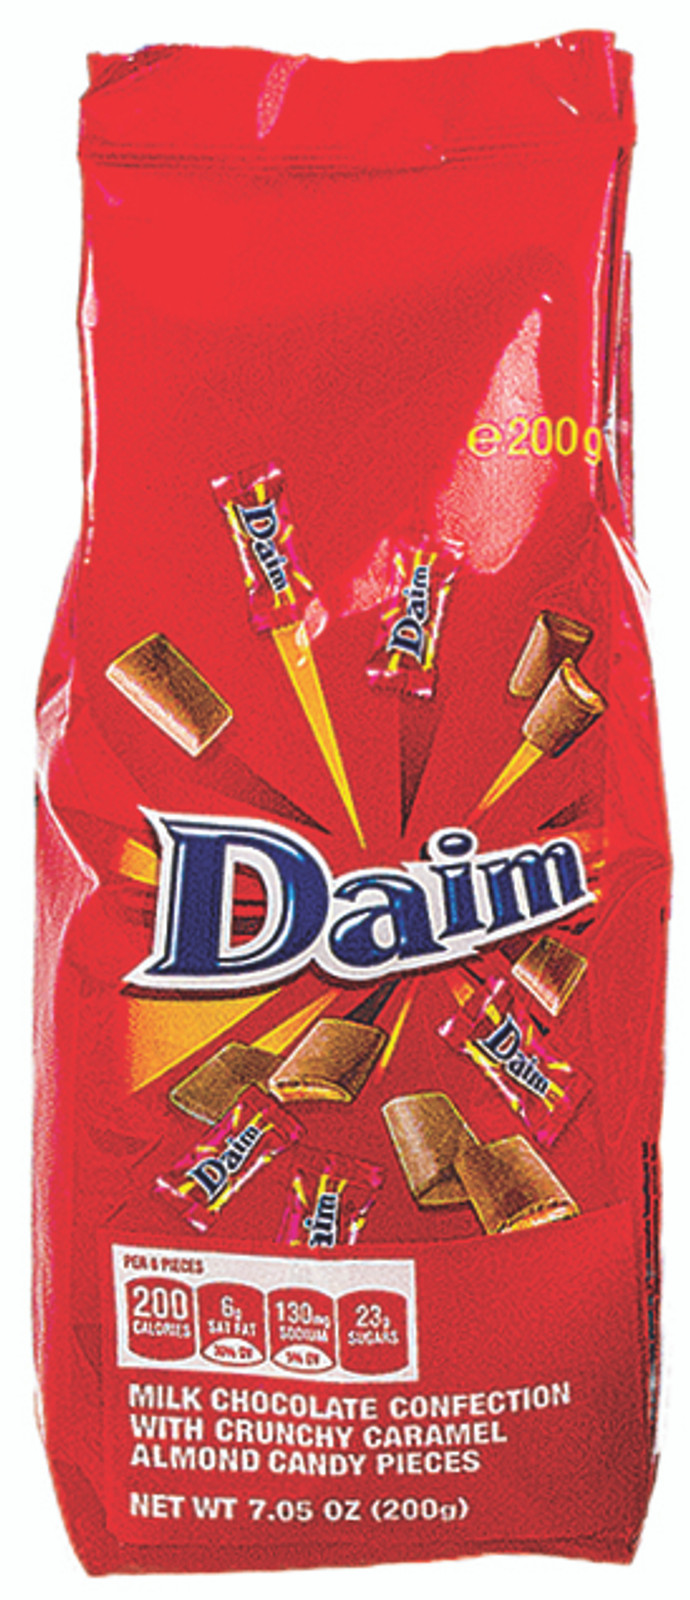 Bag of Imported Swedish Daim Mini Bars